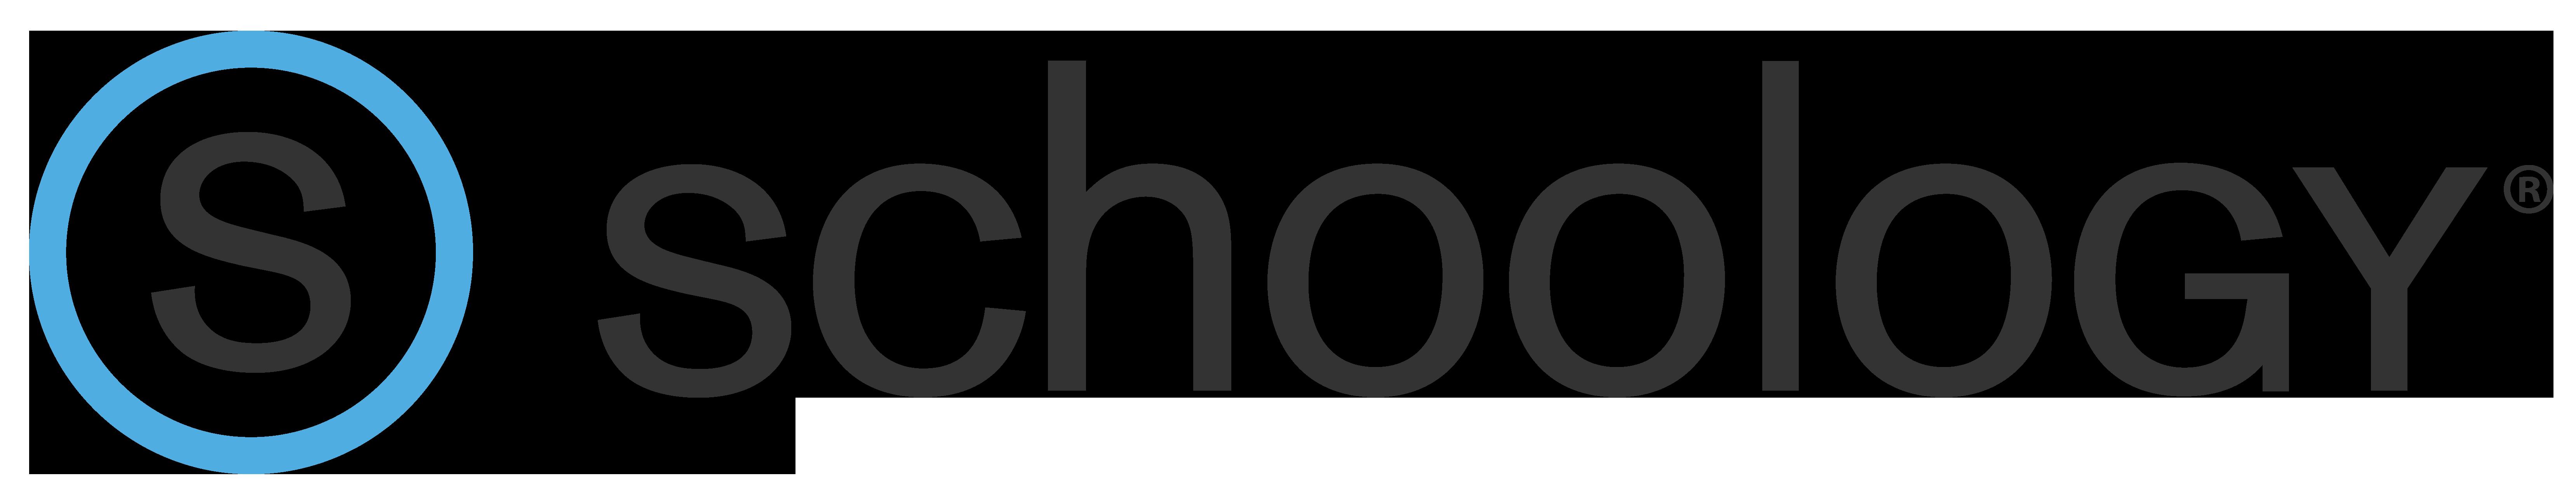 How do I reset student passwords? – Schoology Support